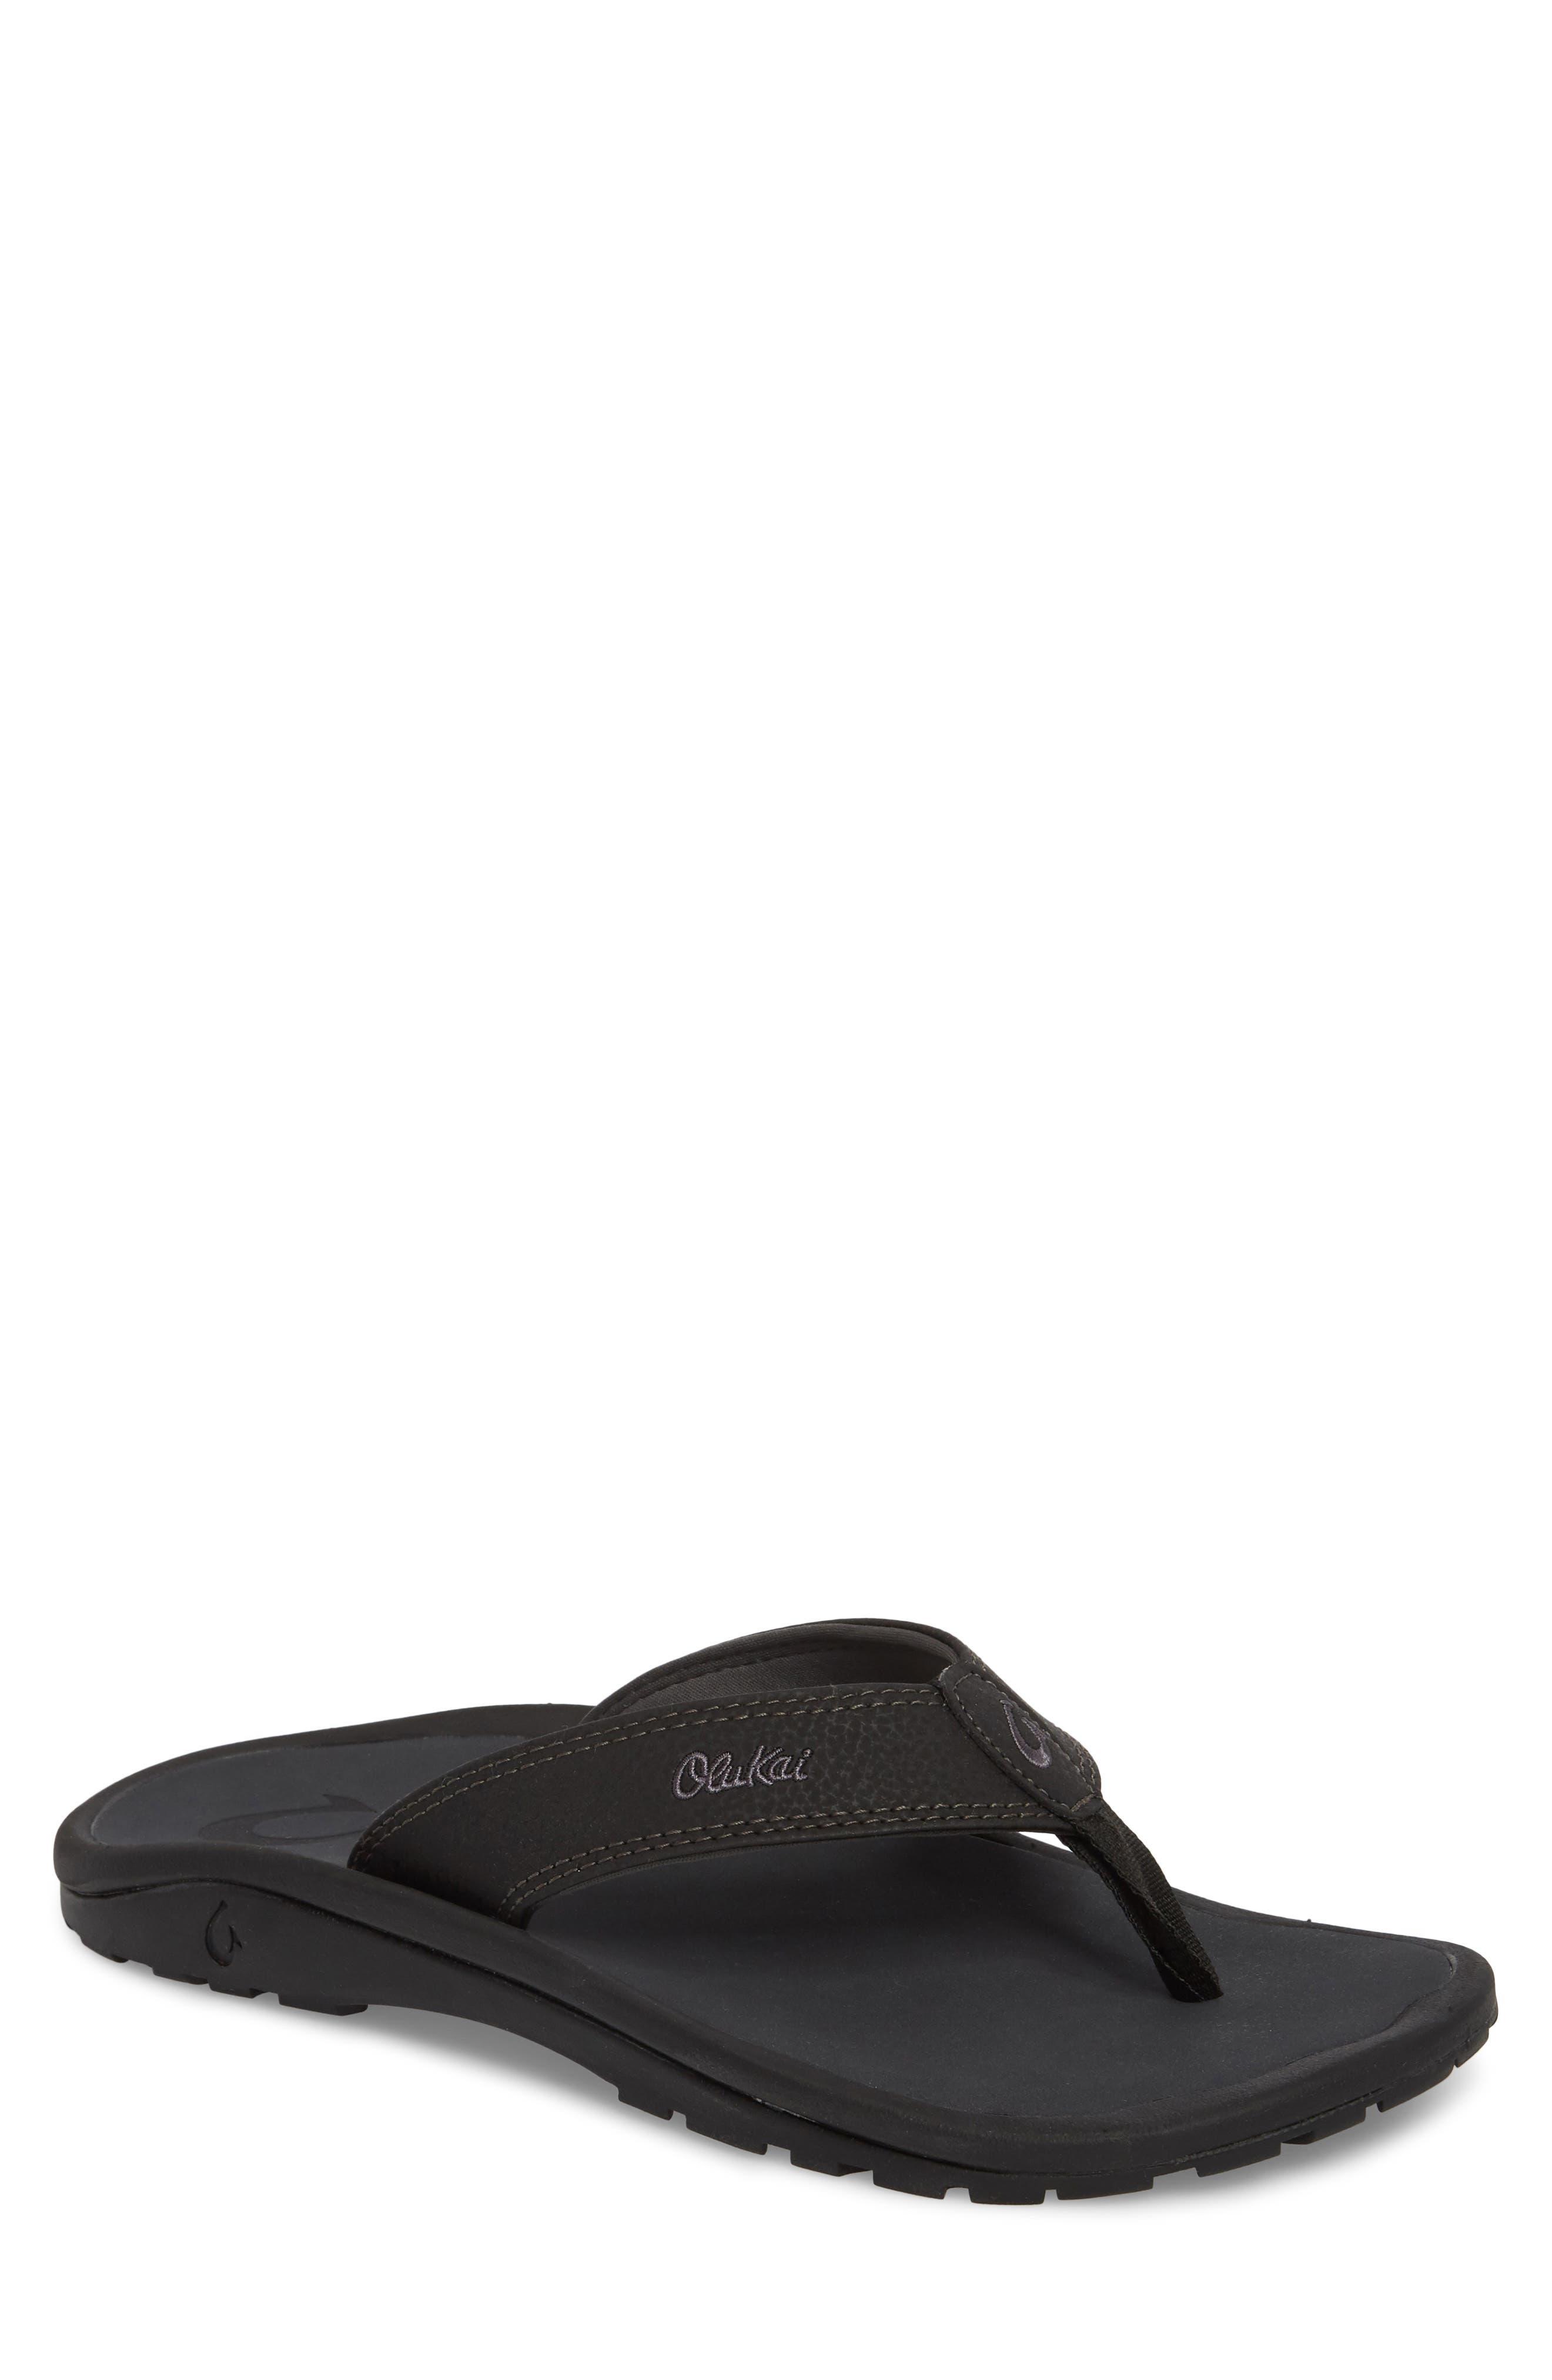 'Ohana' Flip Flop,                         Main,                         color, BLACK/ DARK SHADOW